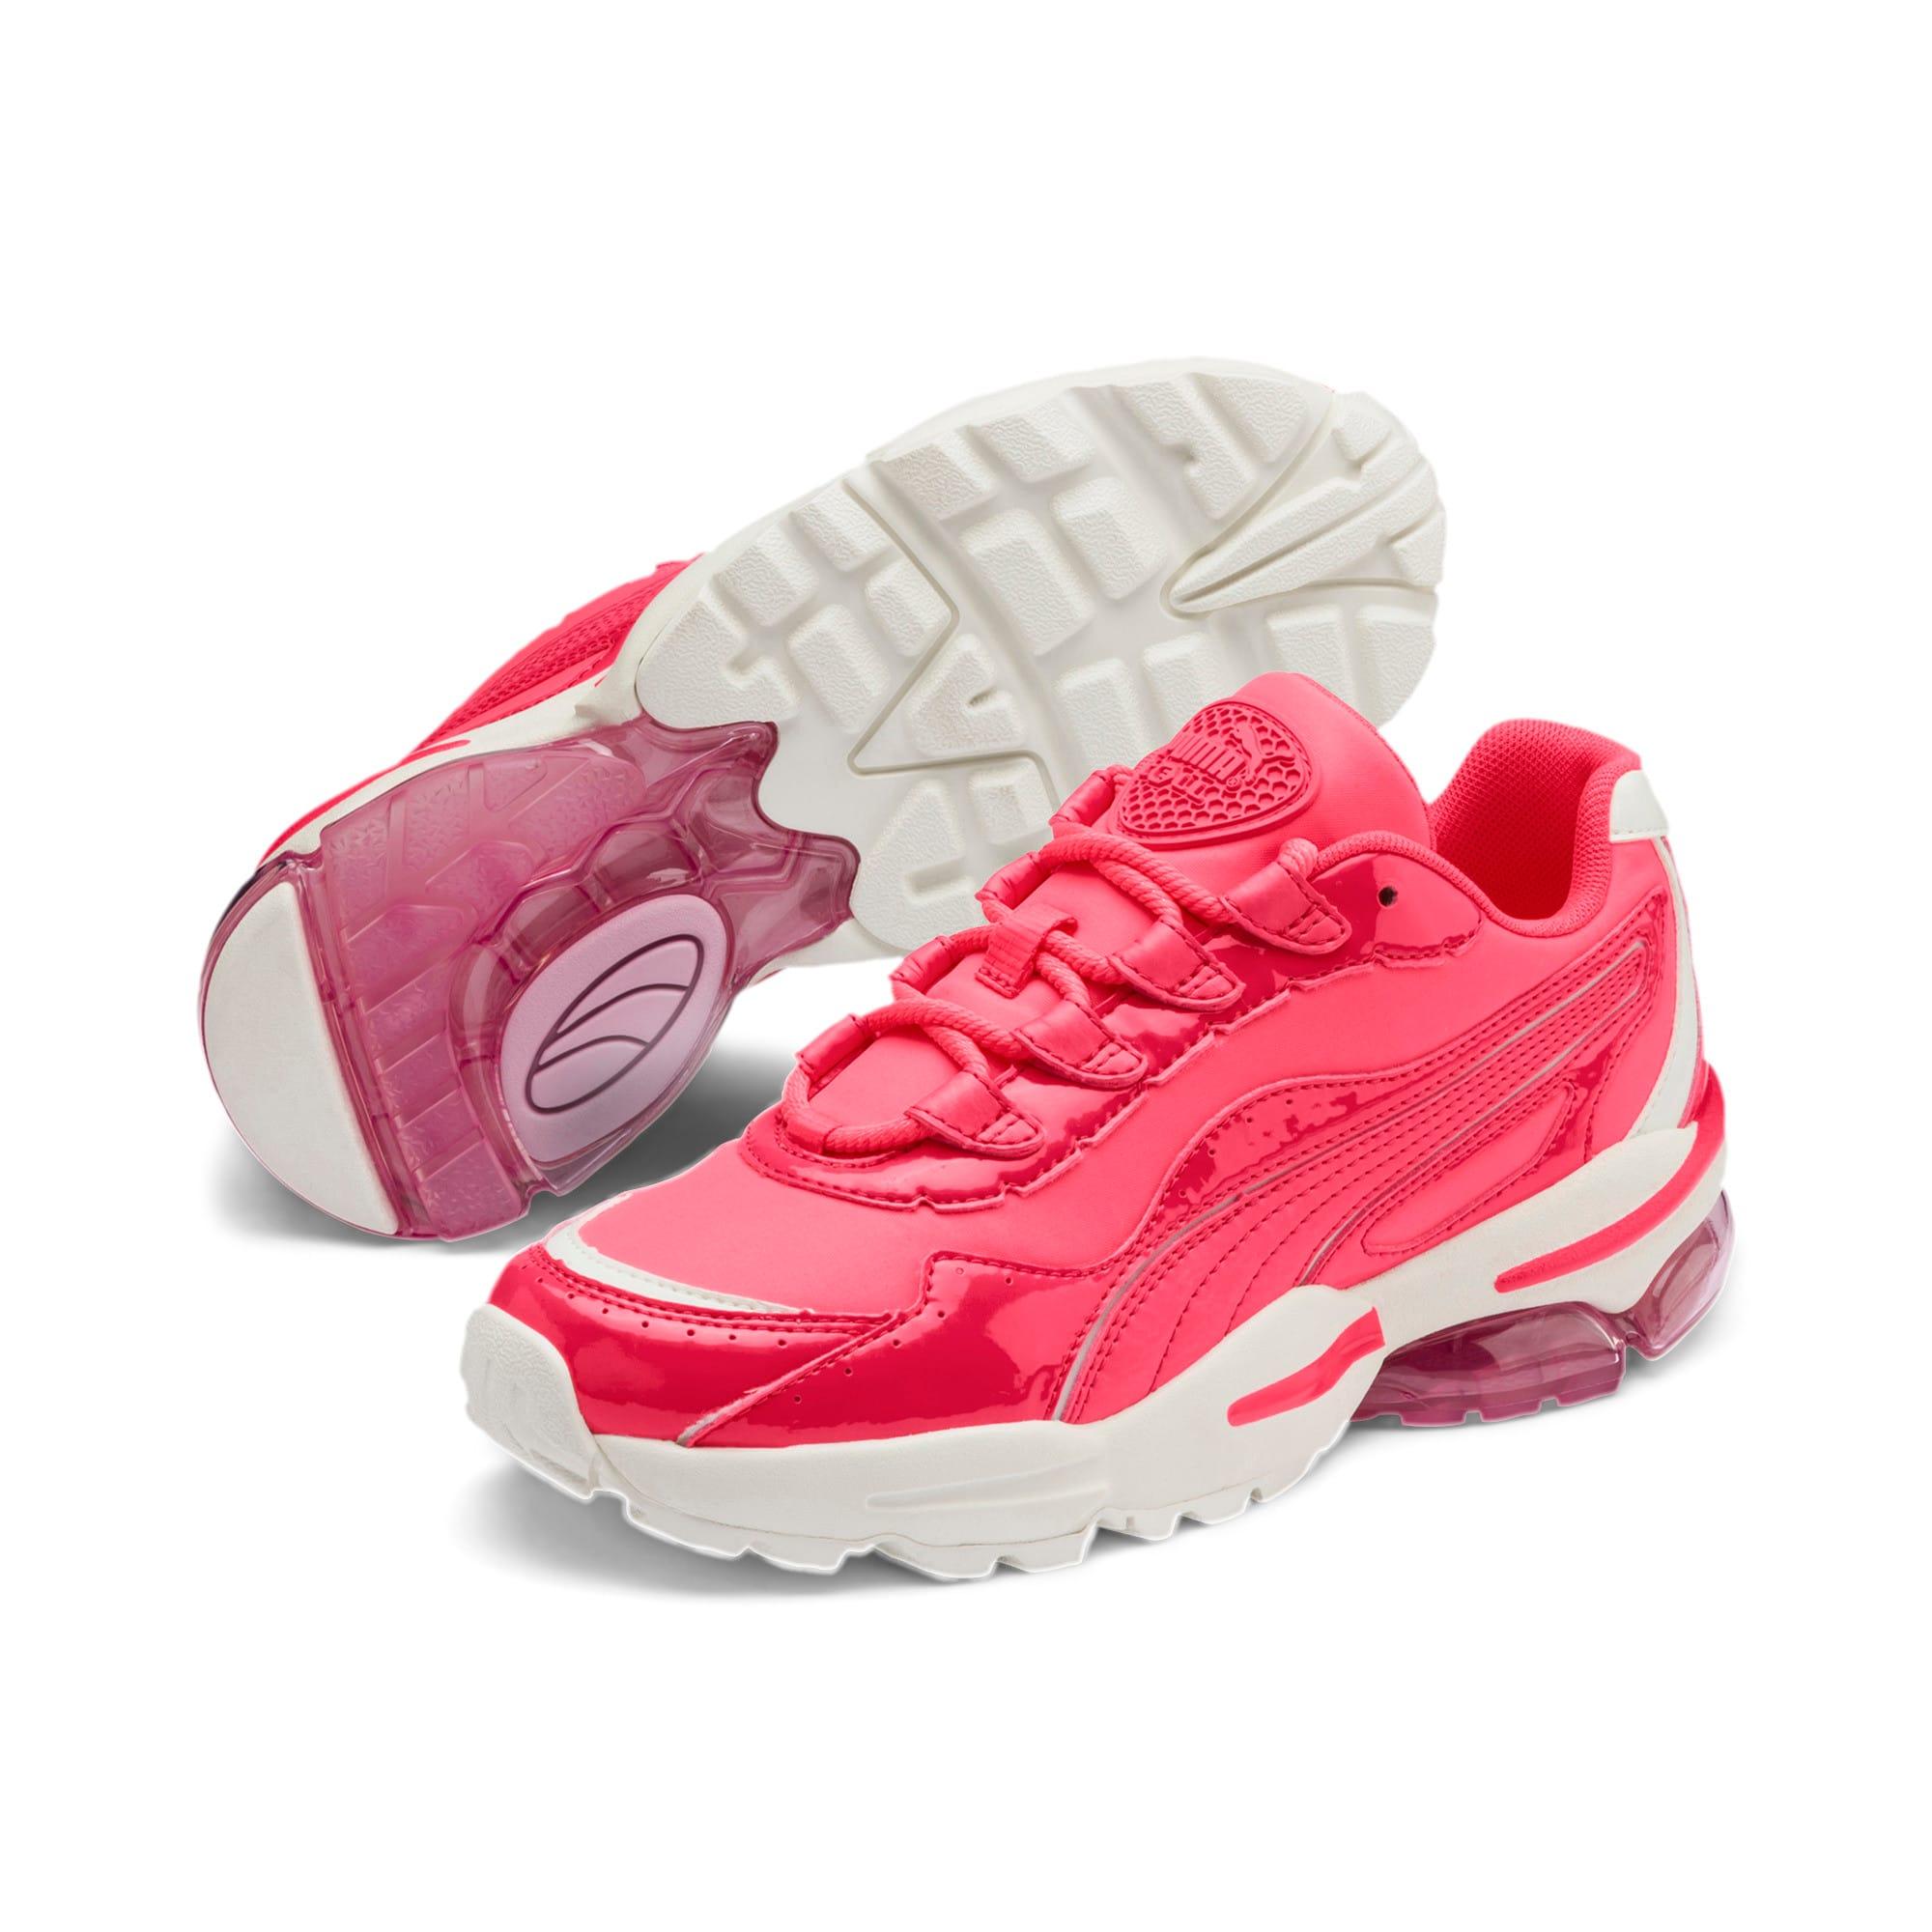 Thumbnail 3 of CELL Stellar Neon Women's Sneakers, Pink Alert-Heather, medium